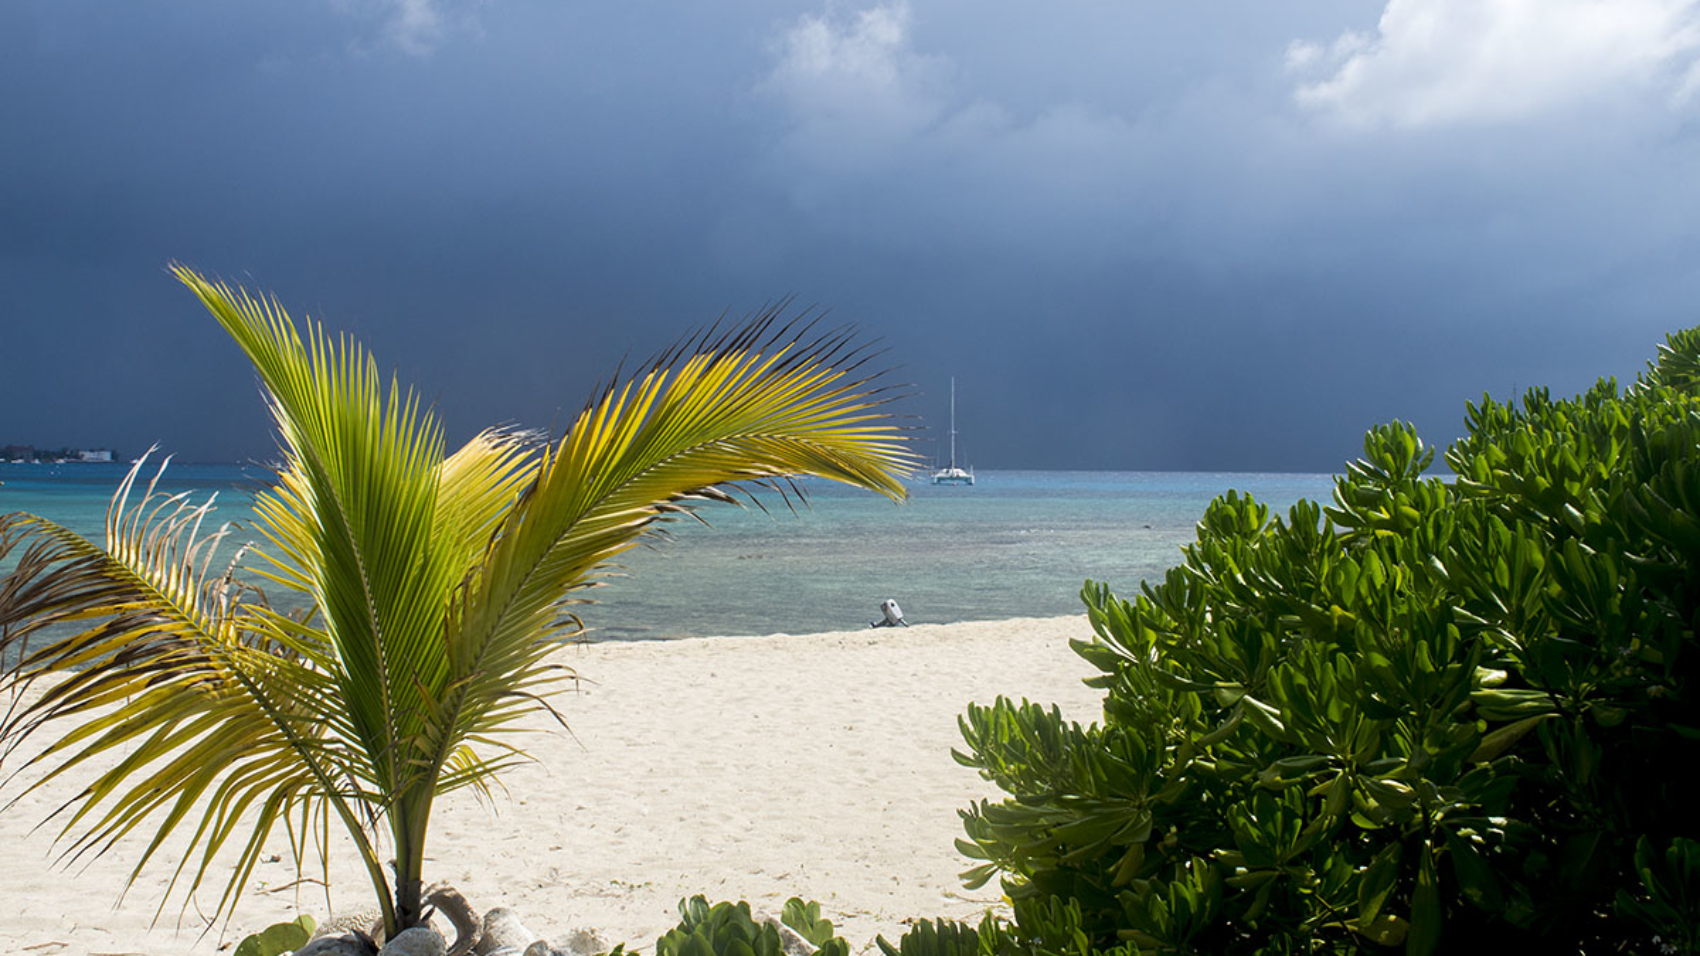 Cayman edit 4